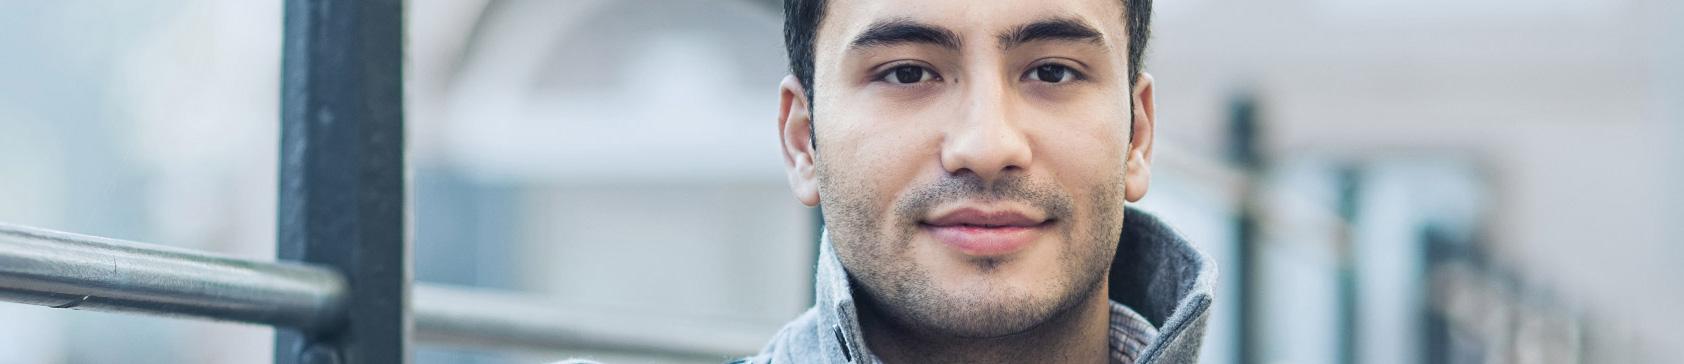 Mojazarplata.az - Карьера Советы для людей Азербайджан